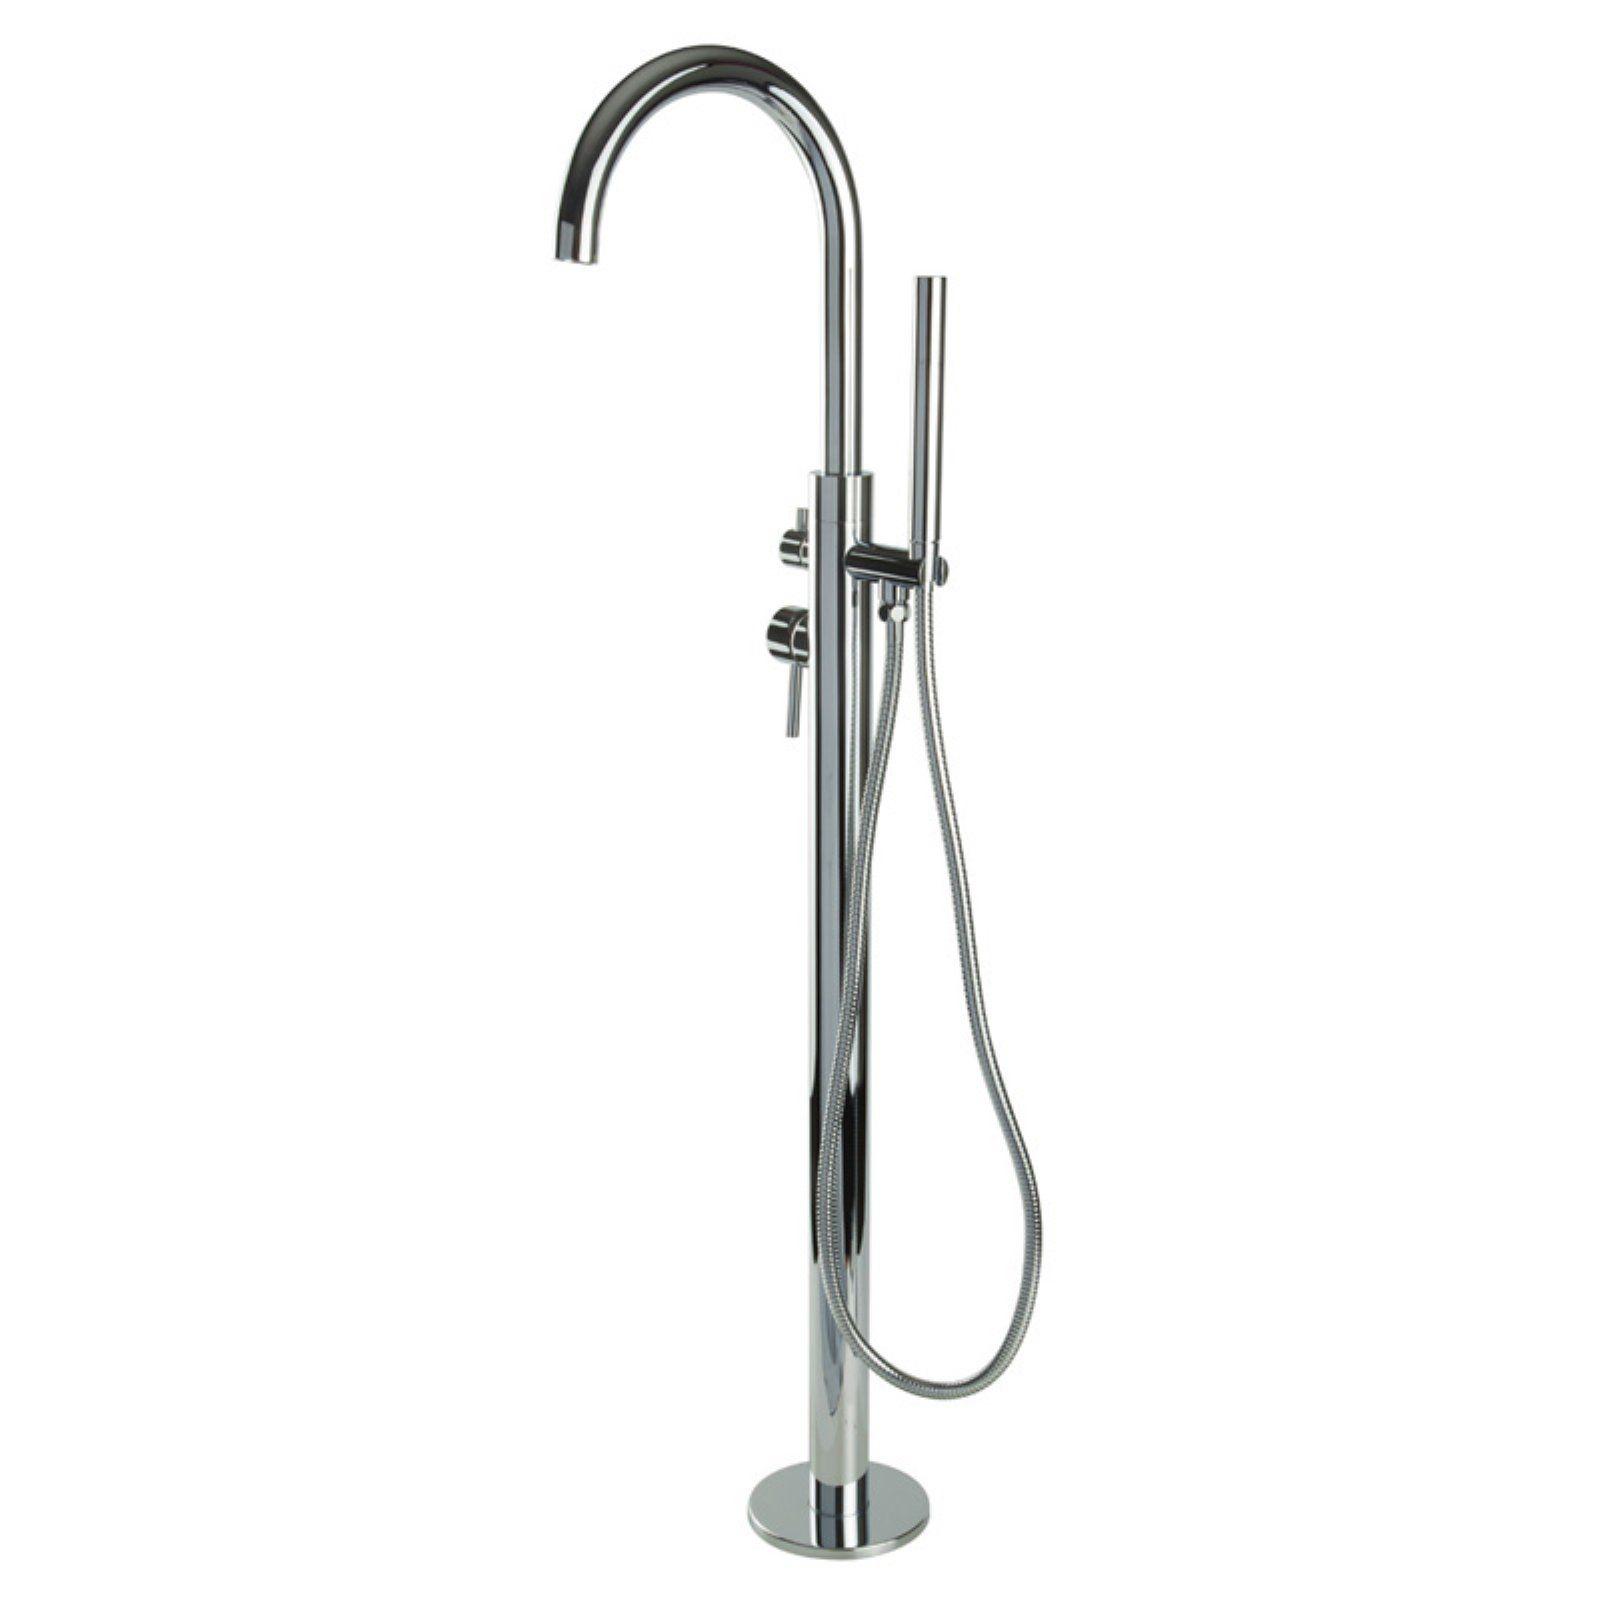 Borhn Osseo B51297 Floor Mounted Bathtub Faucet With Hand Shower